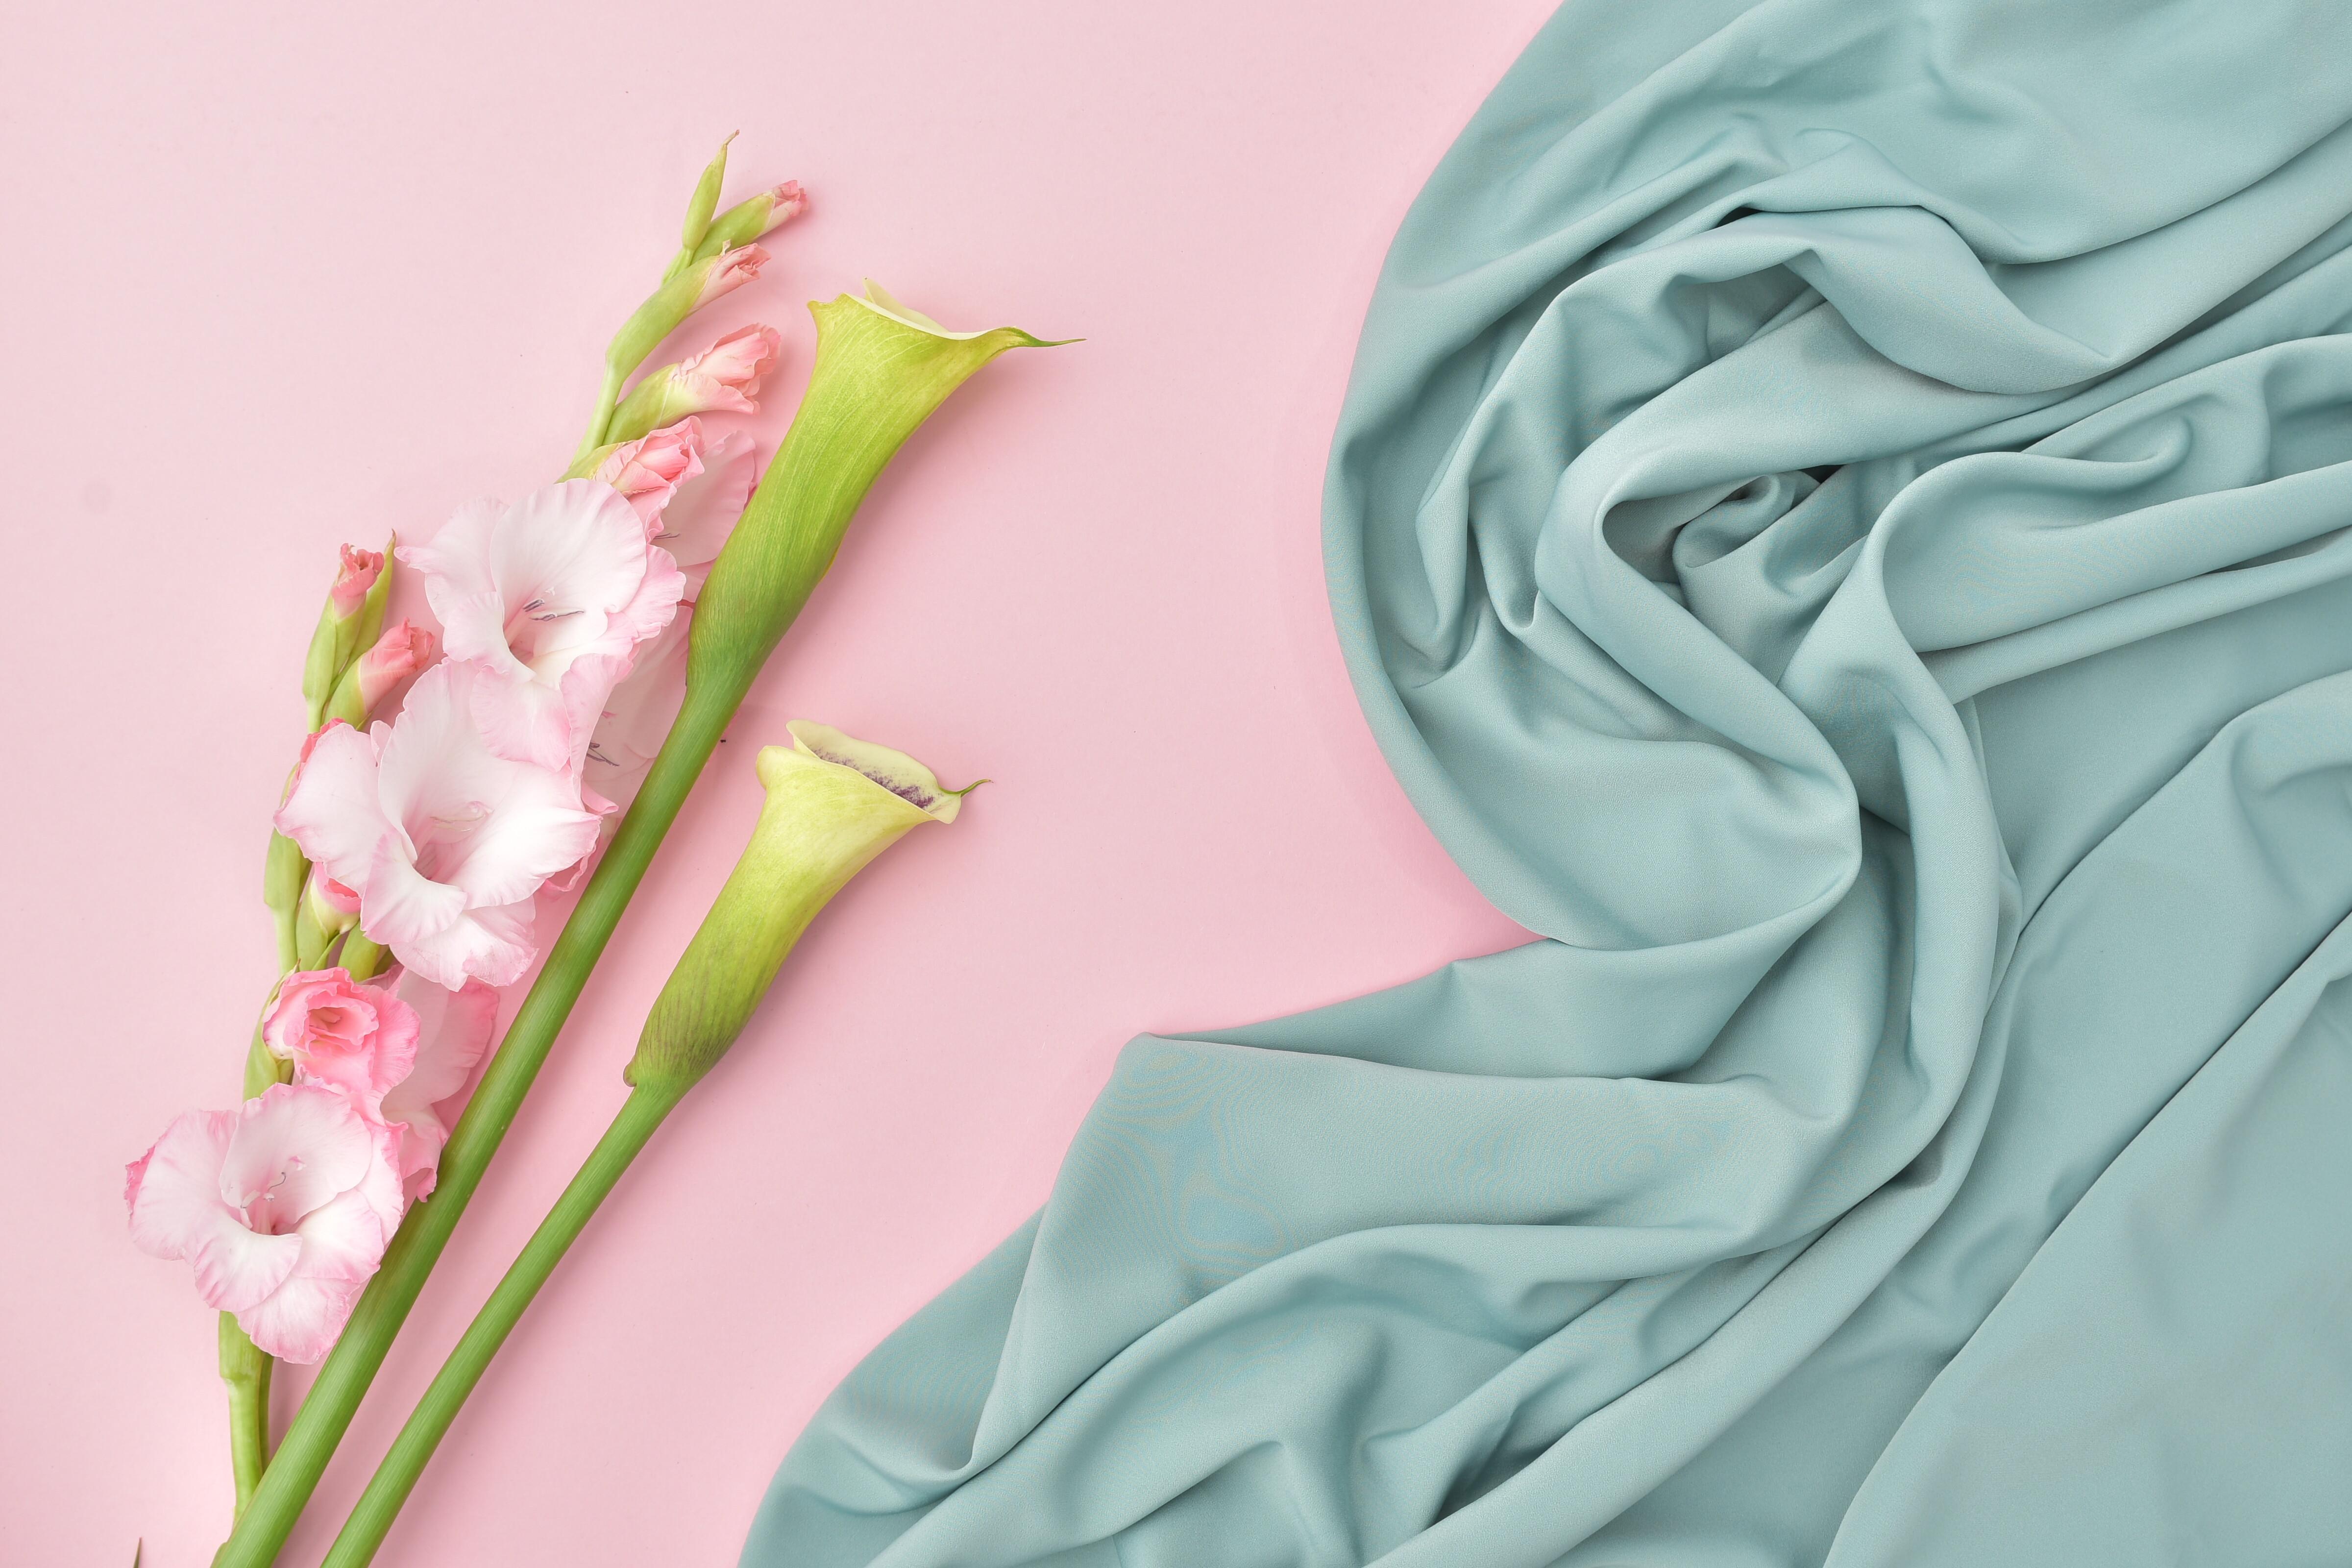 Ткань трикотажная на розовом фоне с цветком